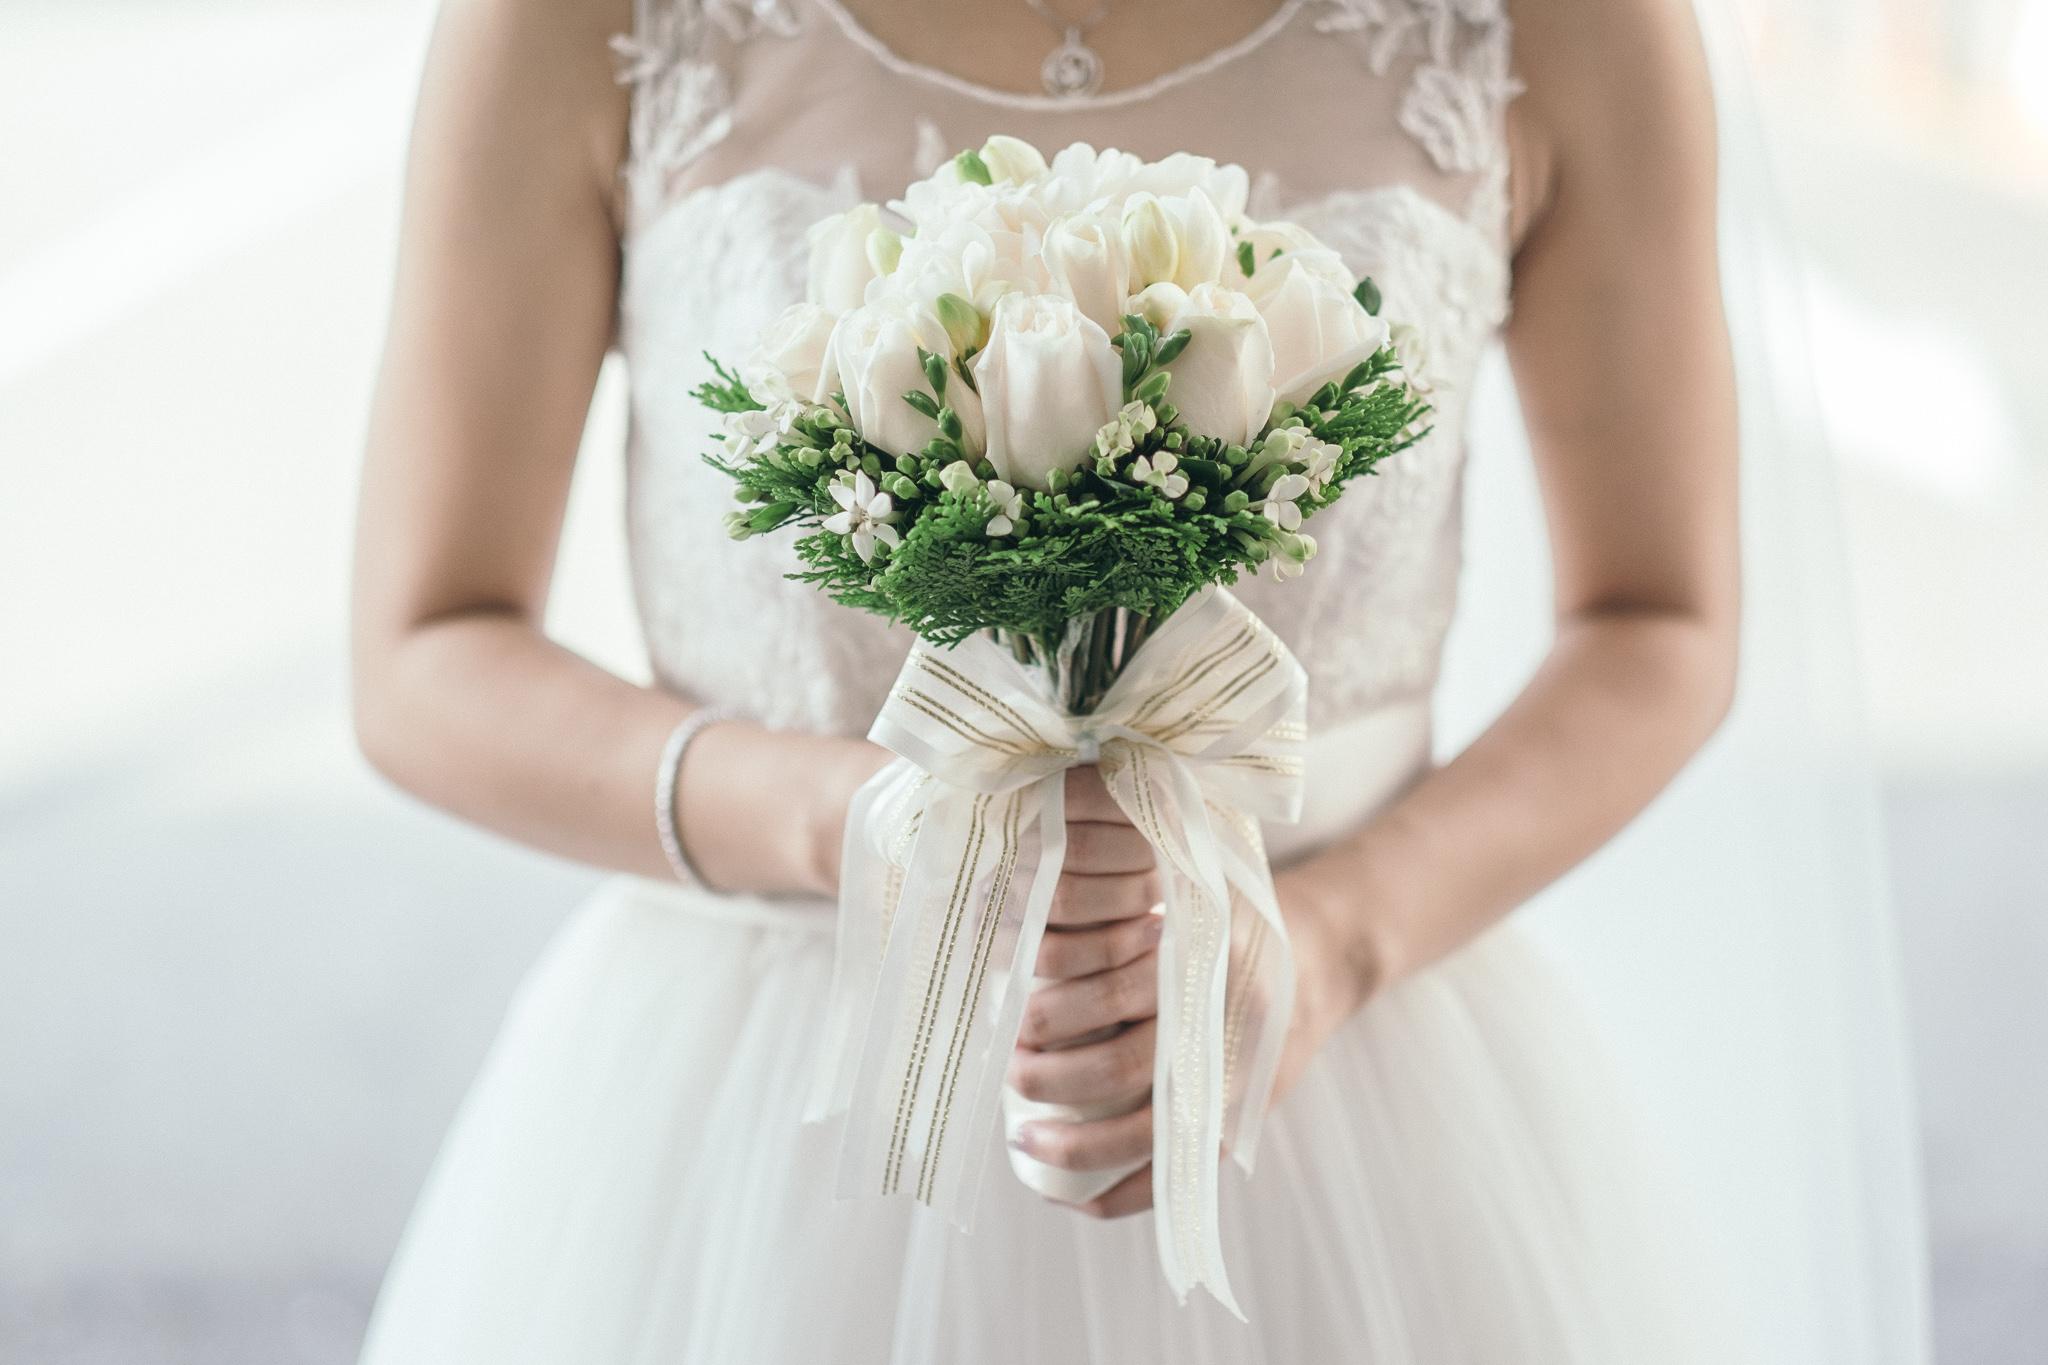 Juxtapose Pix - Wedding - Kelvin & Serene - church regent hotel 00018.jpg